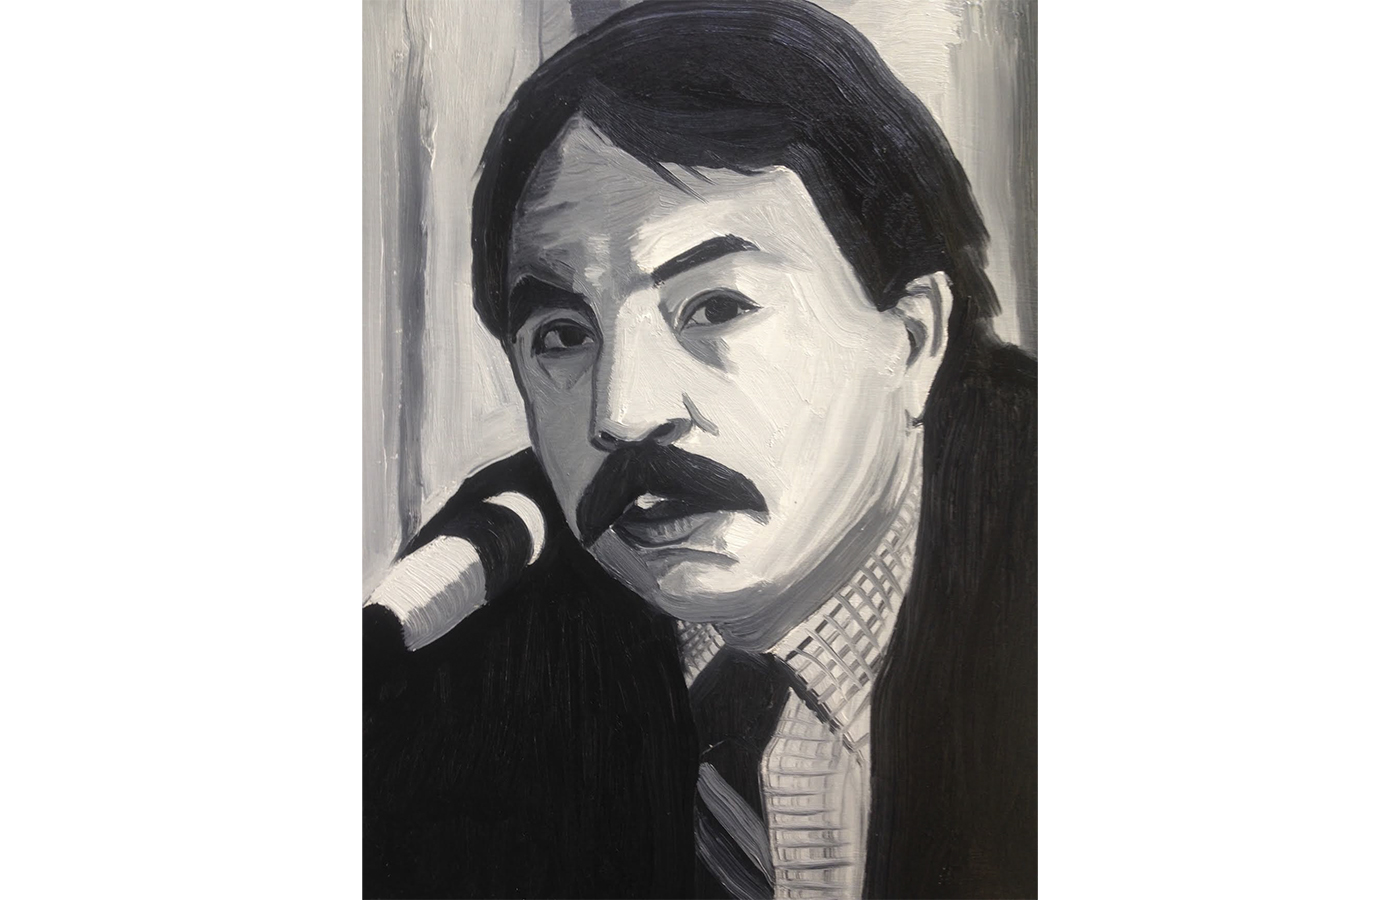 dailybruin.com: Remembering professor Juan Gómez-Quiñones, Chicano studies scholar and activist